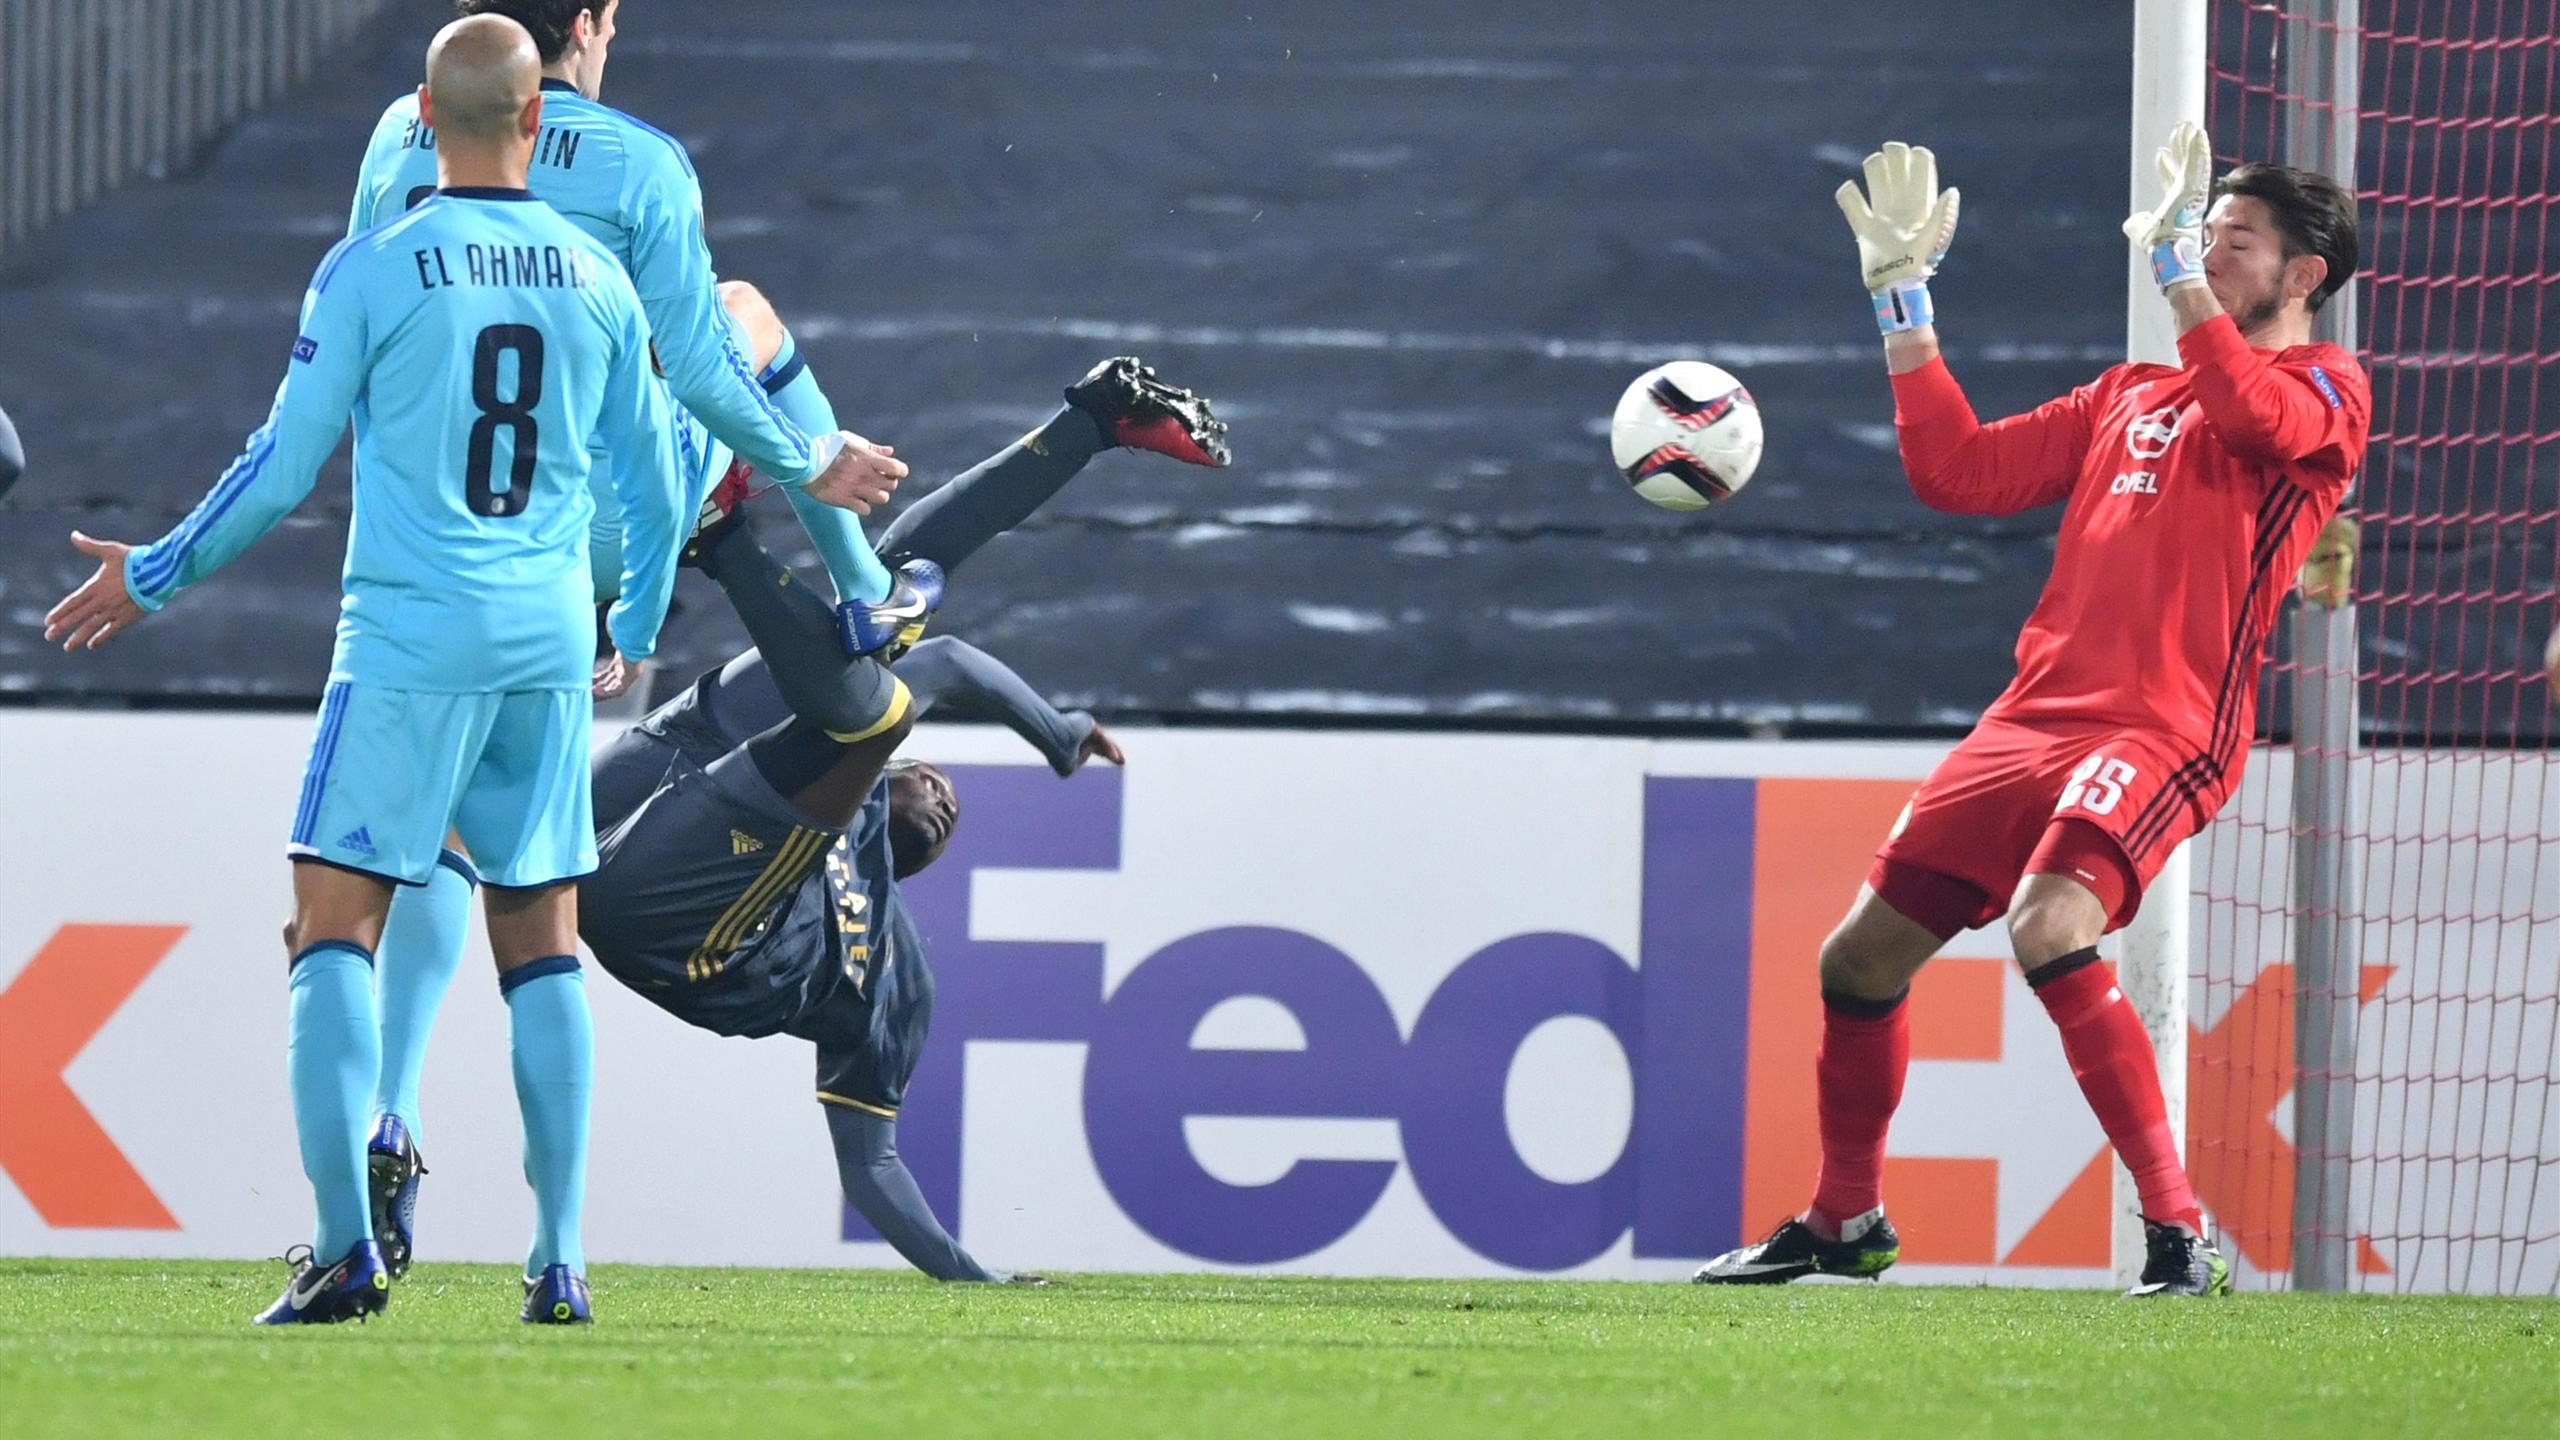 Feyenoord - Fenerbahçe (Moussa Sow)